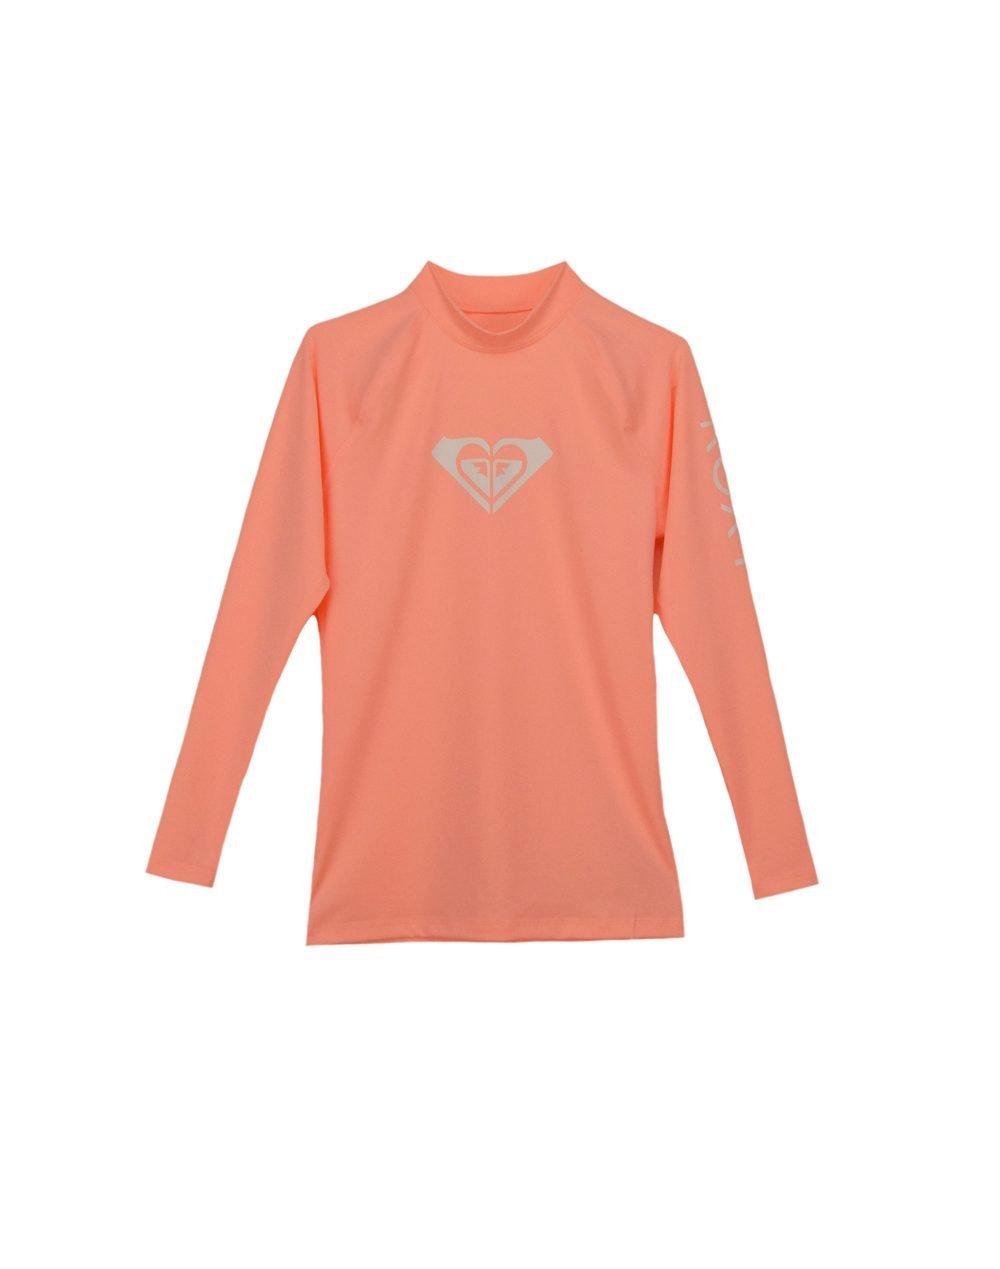 Roxy Whole Hearted Long Sleeve UPF 50 (ERGWR03081-MFG0) Souffle